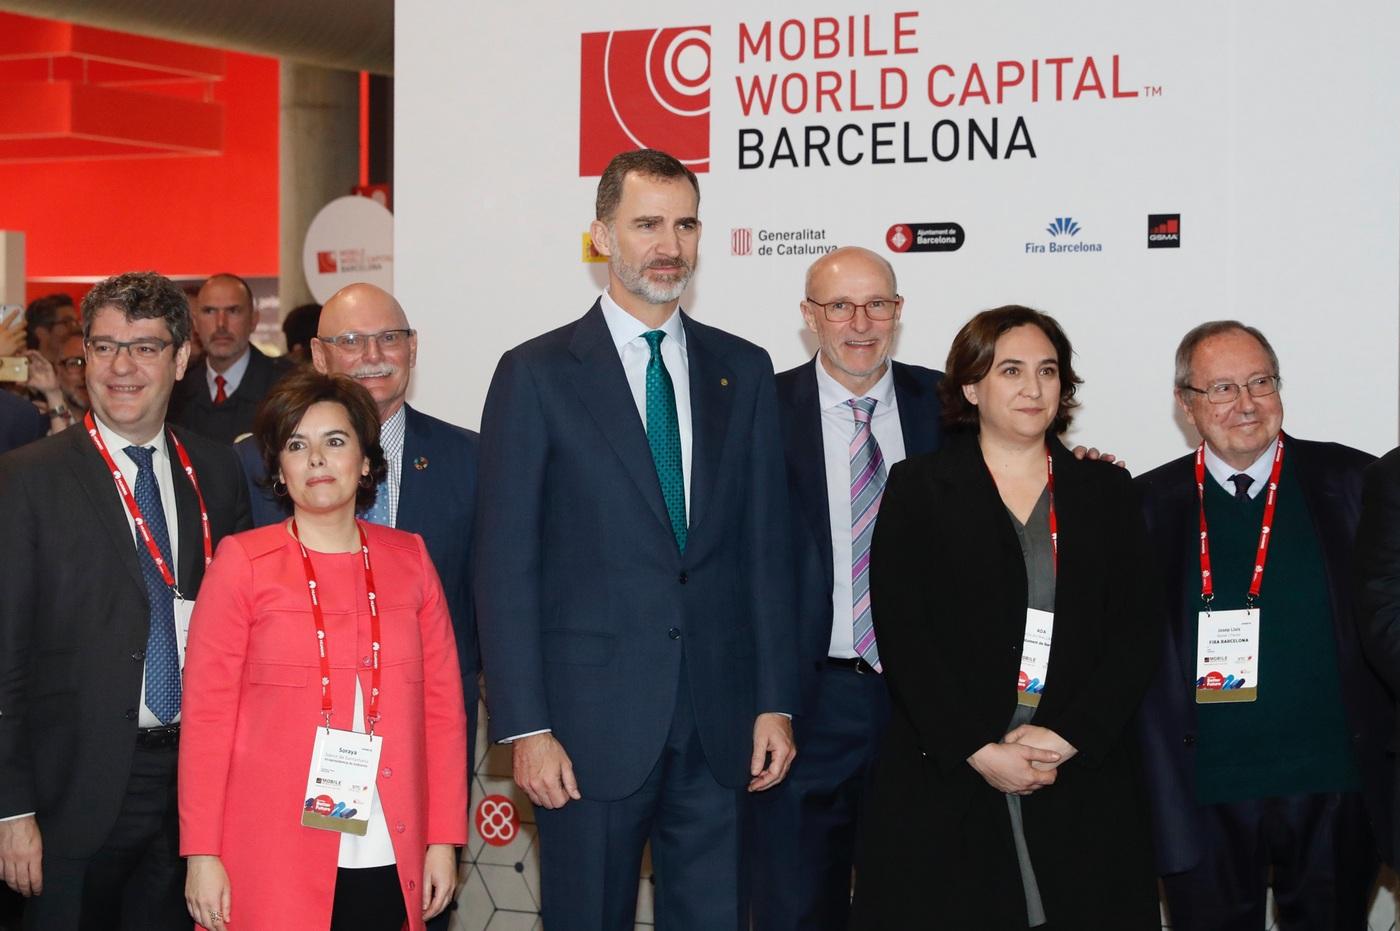 rey_mobile_barcelona_20180226_08